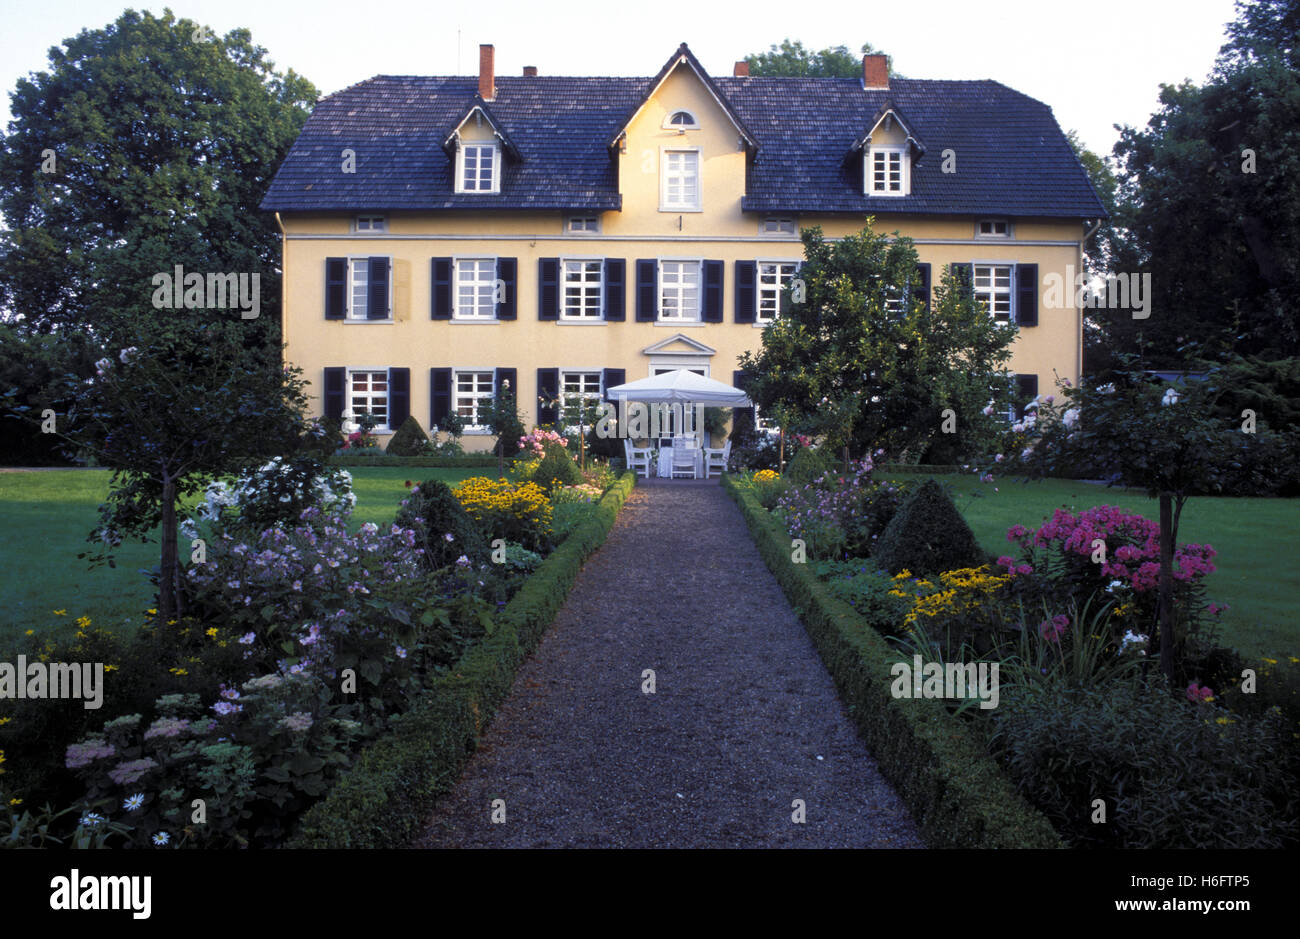 Germany, Lower Saxony, house near Rinteln.  eln. - Stock Image